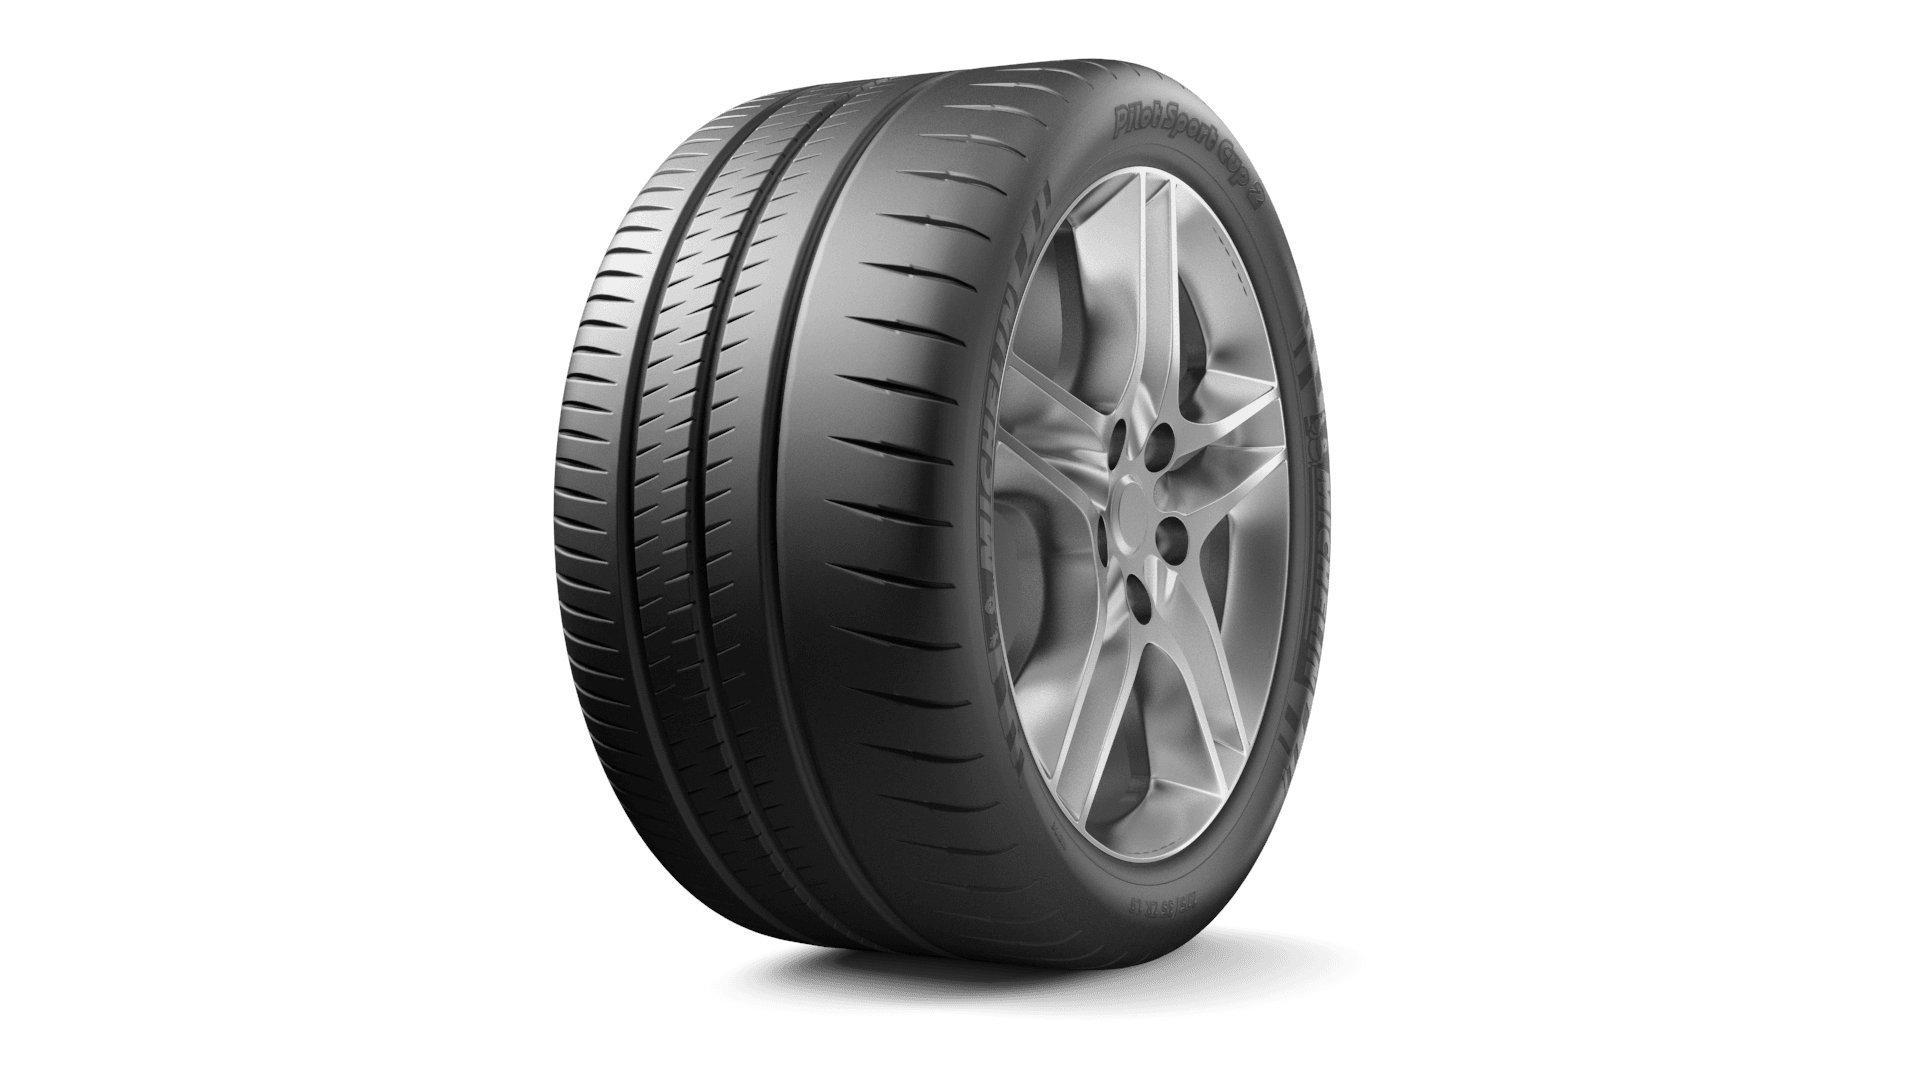 Michelin Pilot Sport >> Michelin Pilot Sport Cup 2 Renkaat